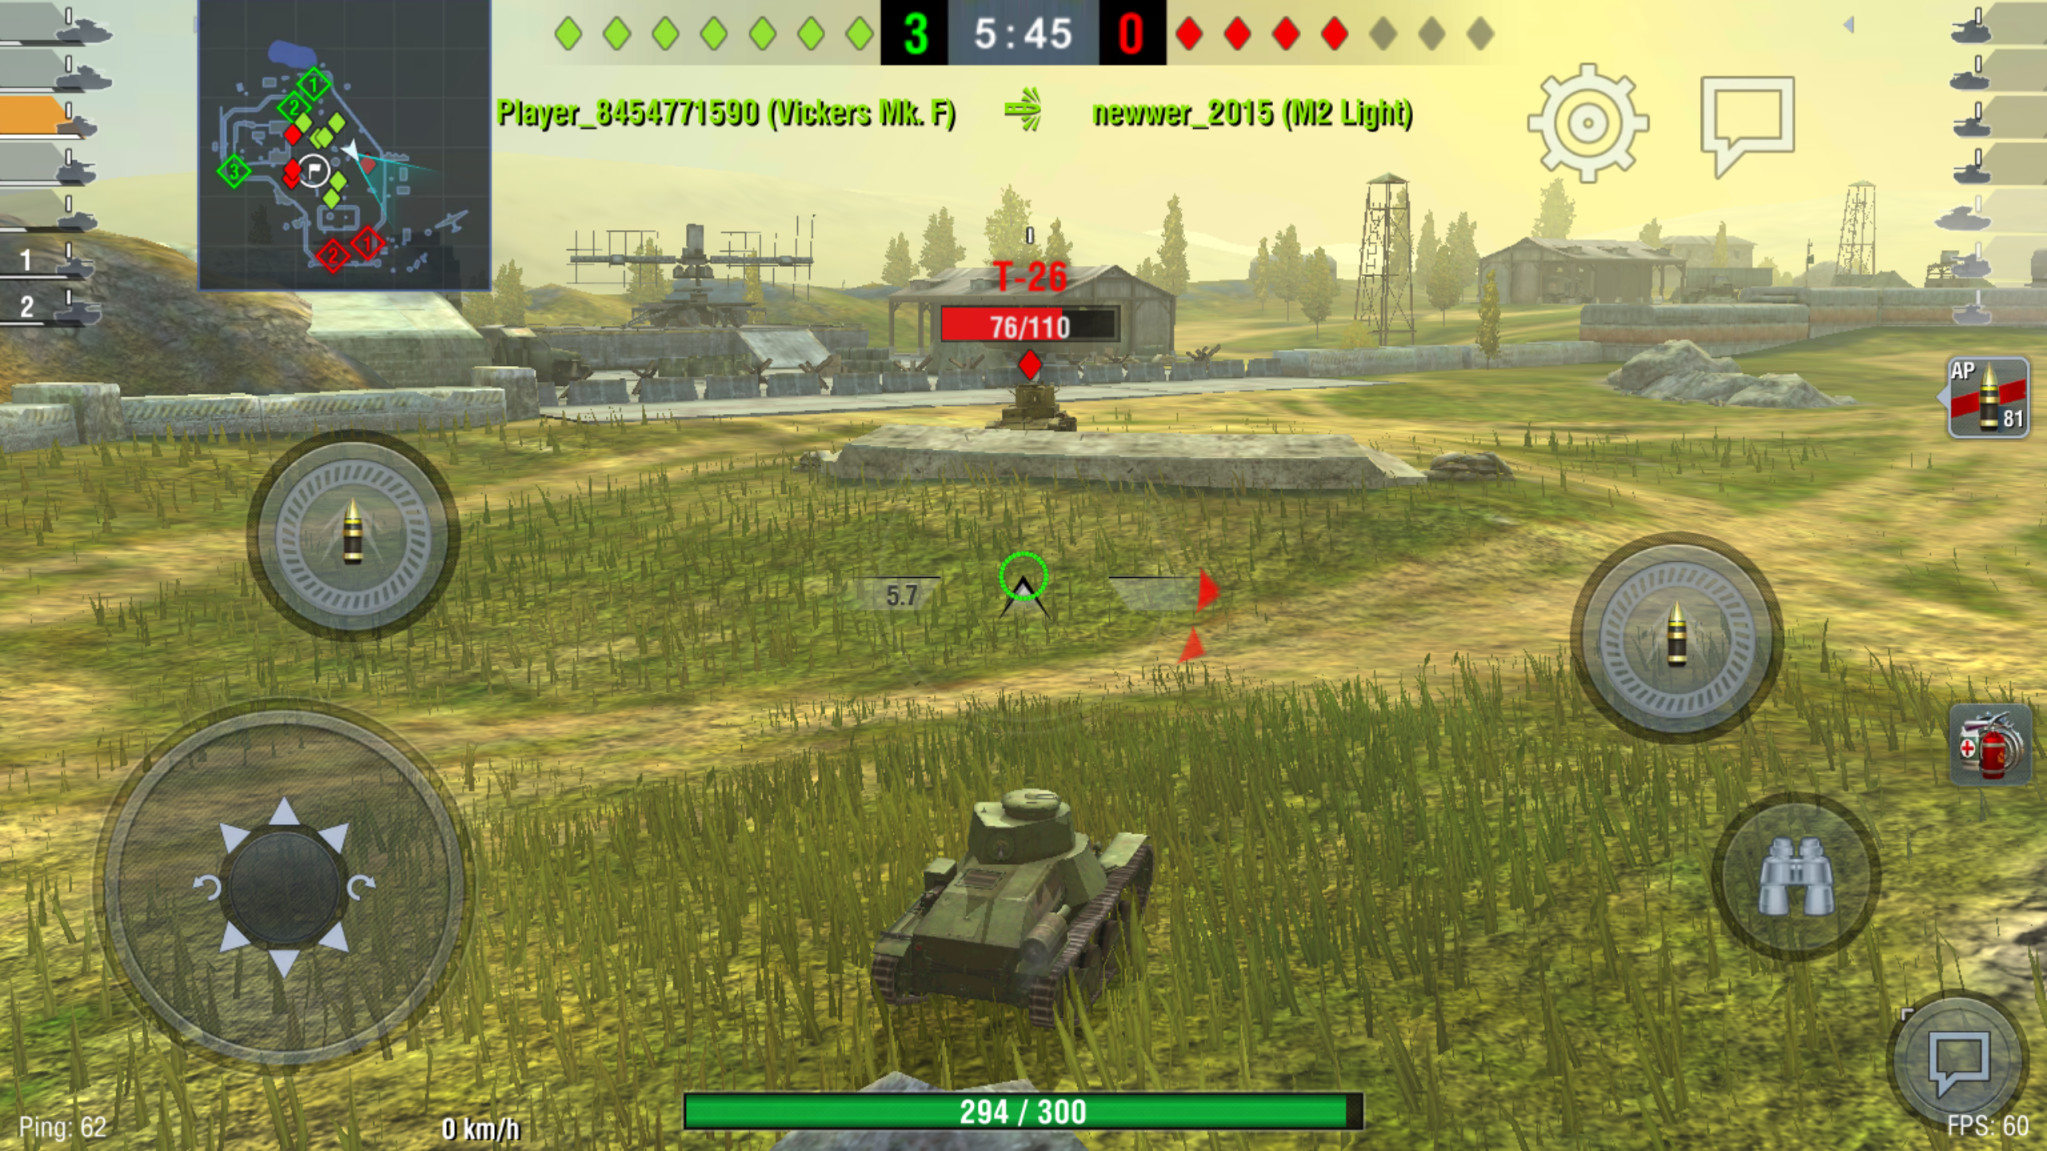 Screenshot 1 - World of Tanks Blitz (Android-App)